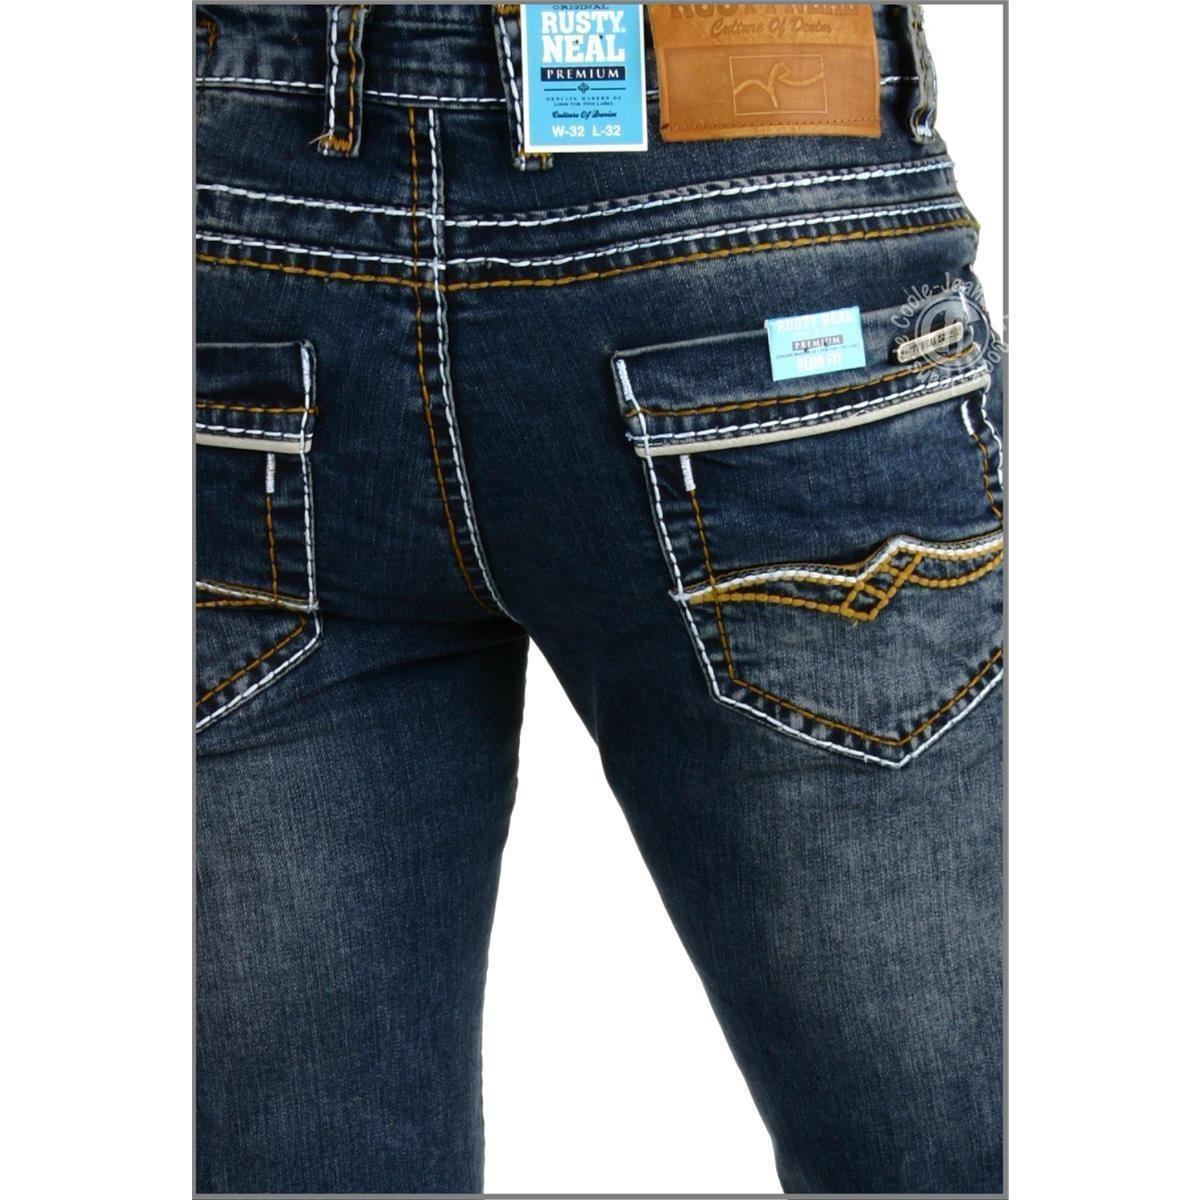 RustyNeal7651HerrenjeansRNealdarkblueweisseNaht  -> Waschmaschine Jeans